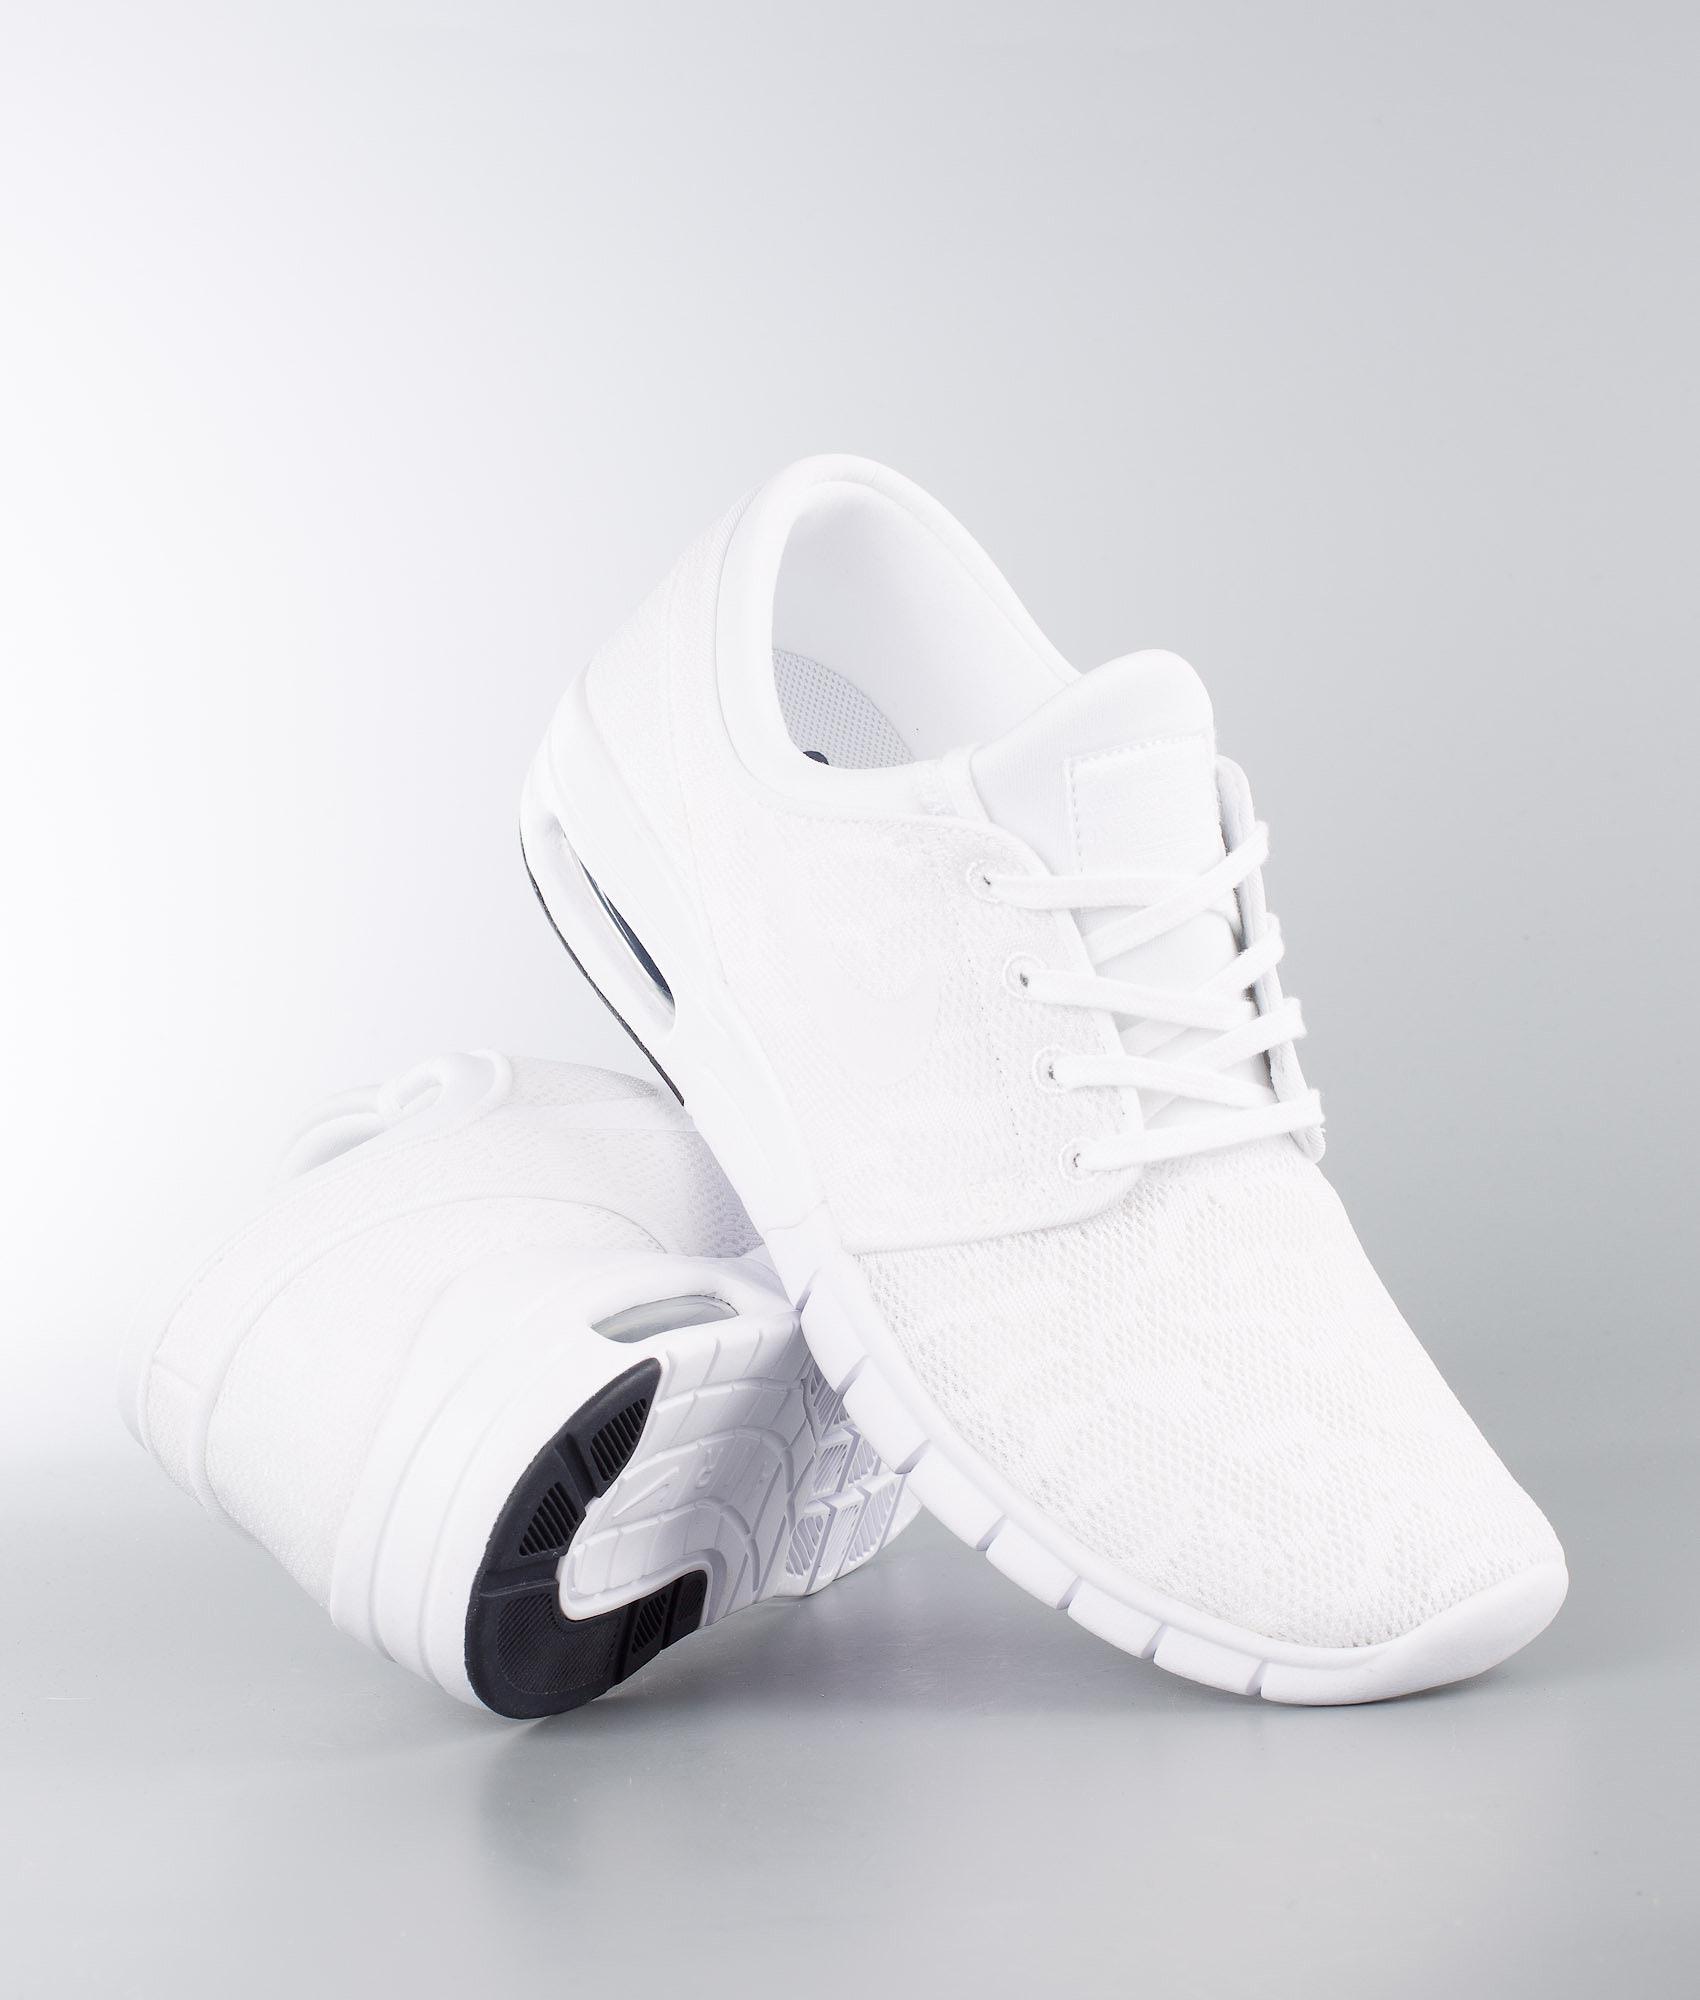 Nike Stefan Janoski Max Shoes White White-Obsidian - Ridestore.com 6d2344c2aeba